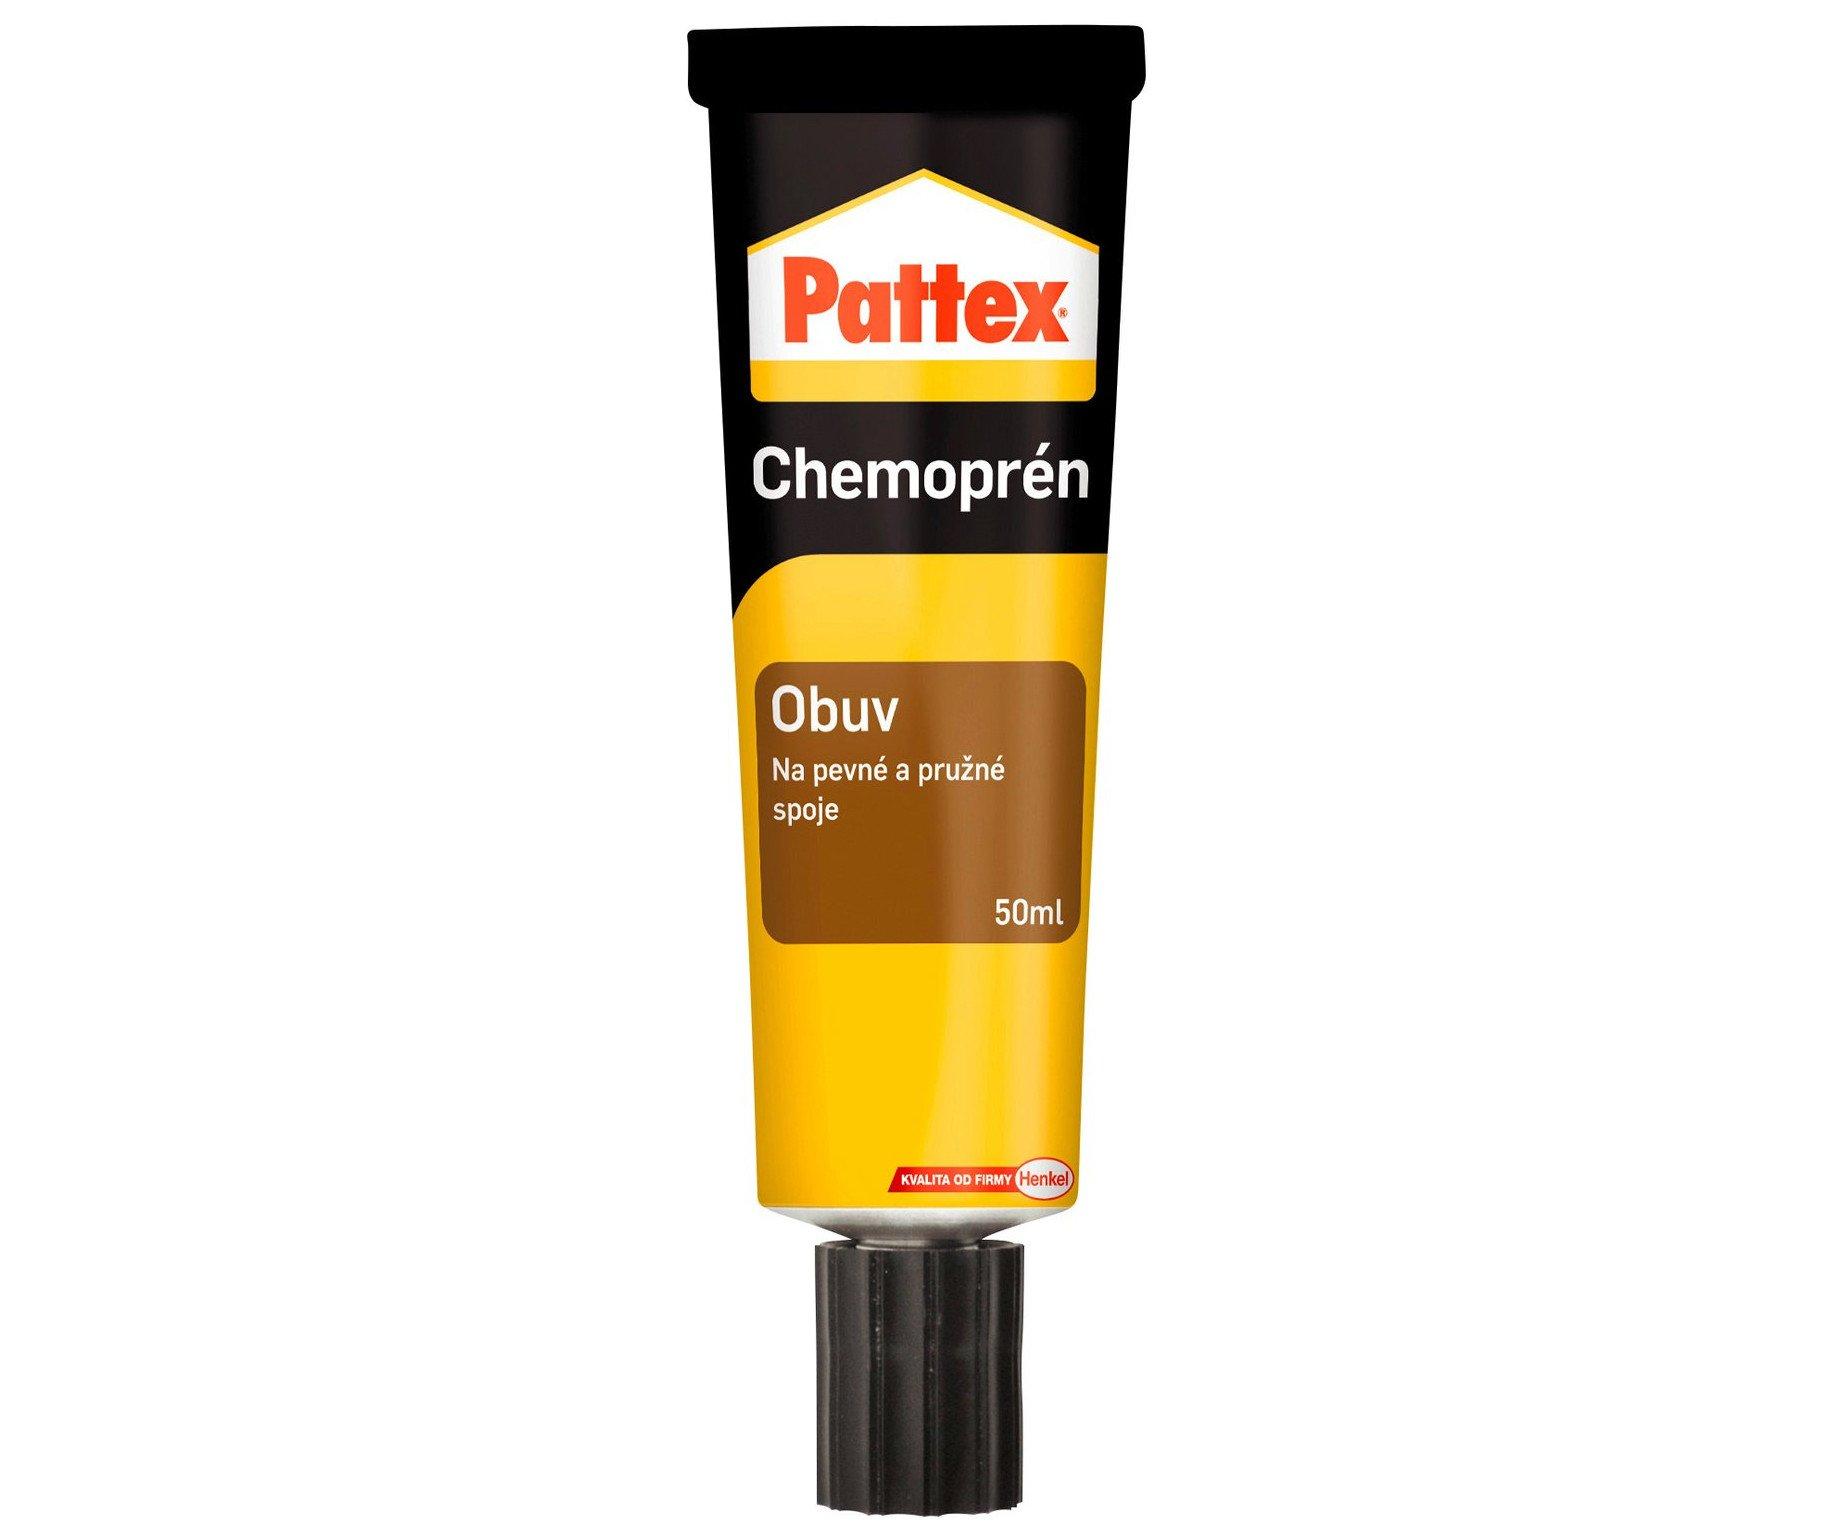 Lepidlo Pattex Chemoprén 50ml obuv